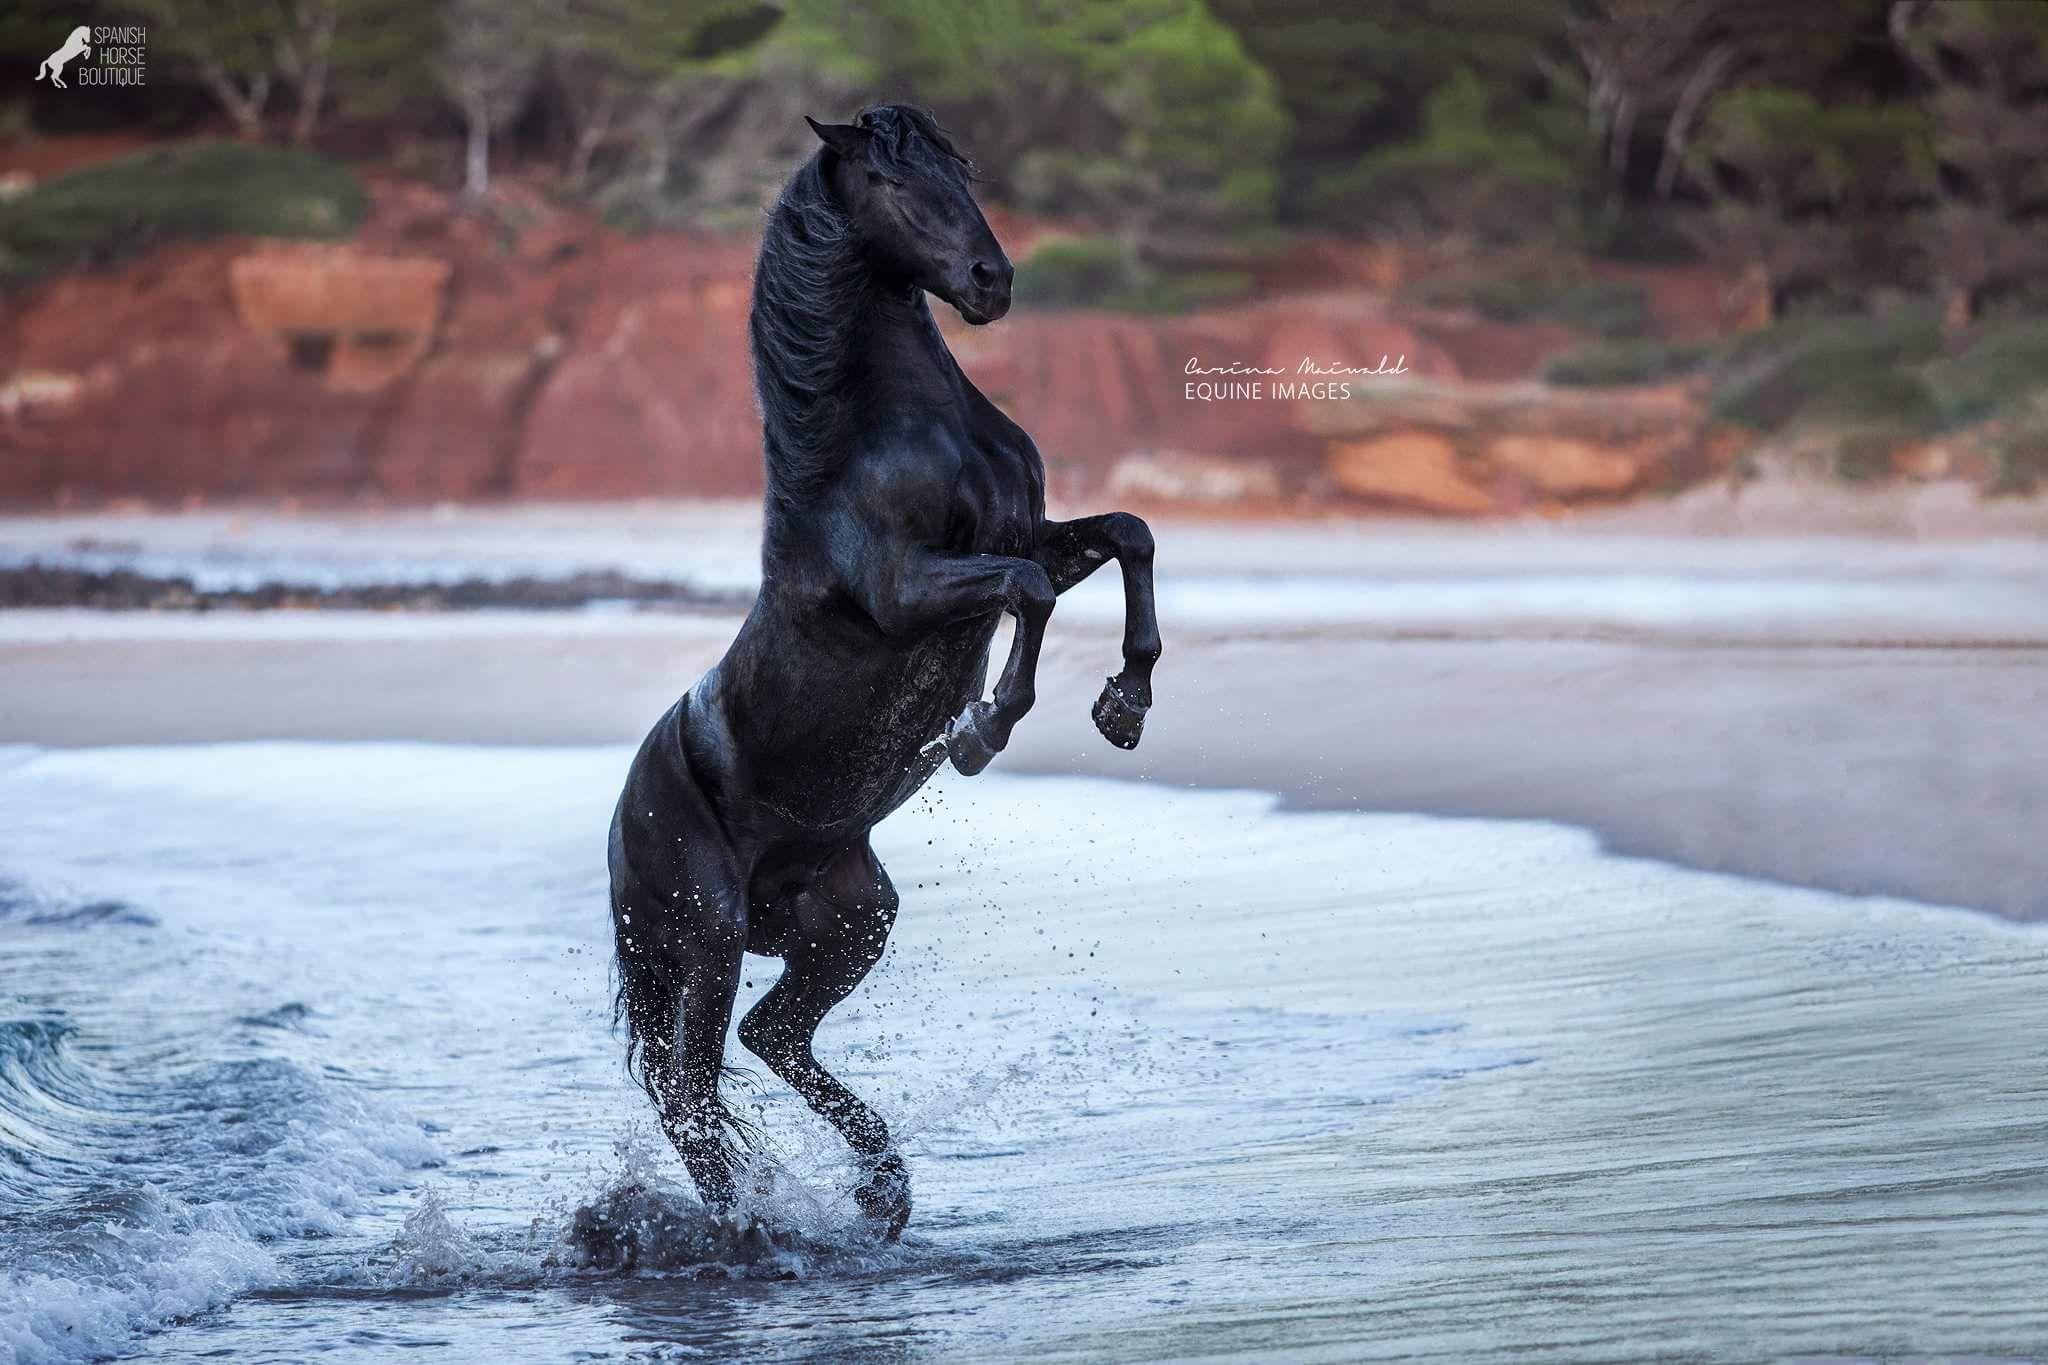 96 Carina Maiwald Photographer Photos Schone Pferde Schwarze Pferde Ausgestopftes Tier